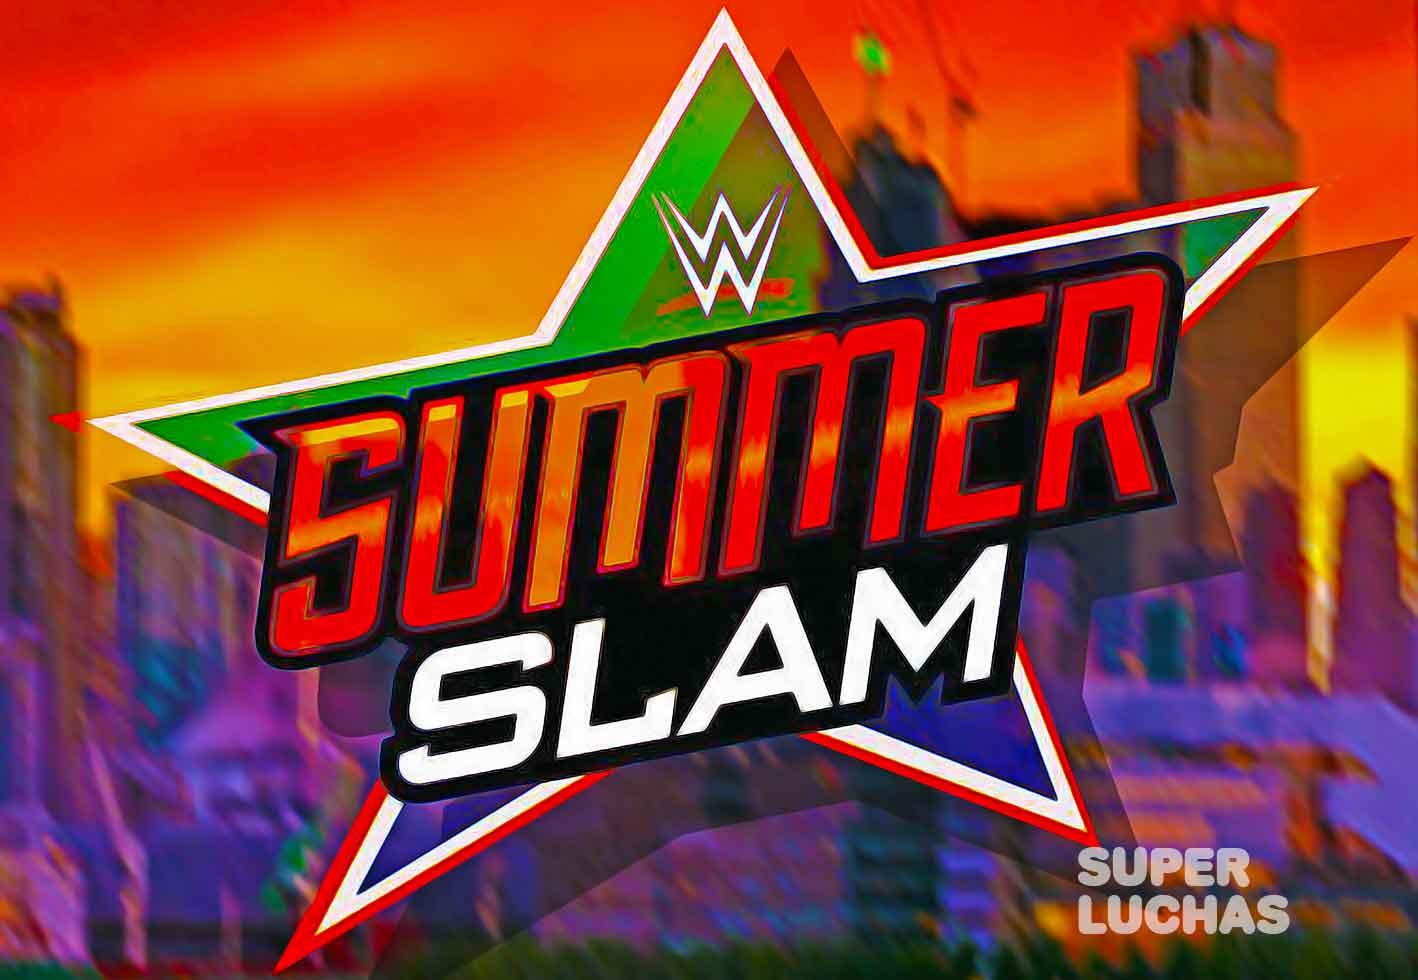 logo SummerSlam